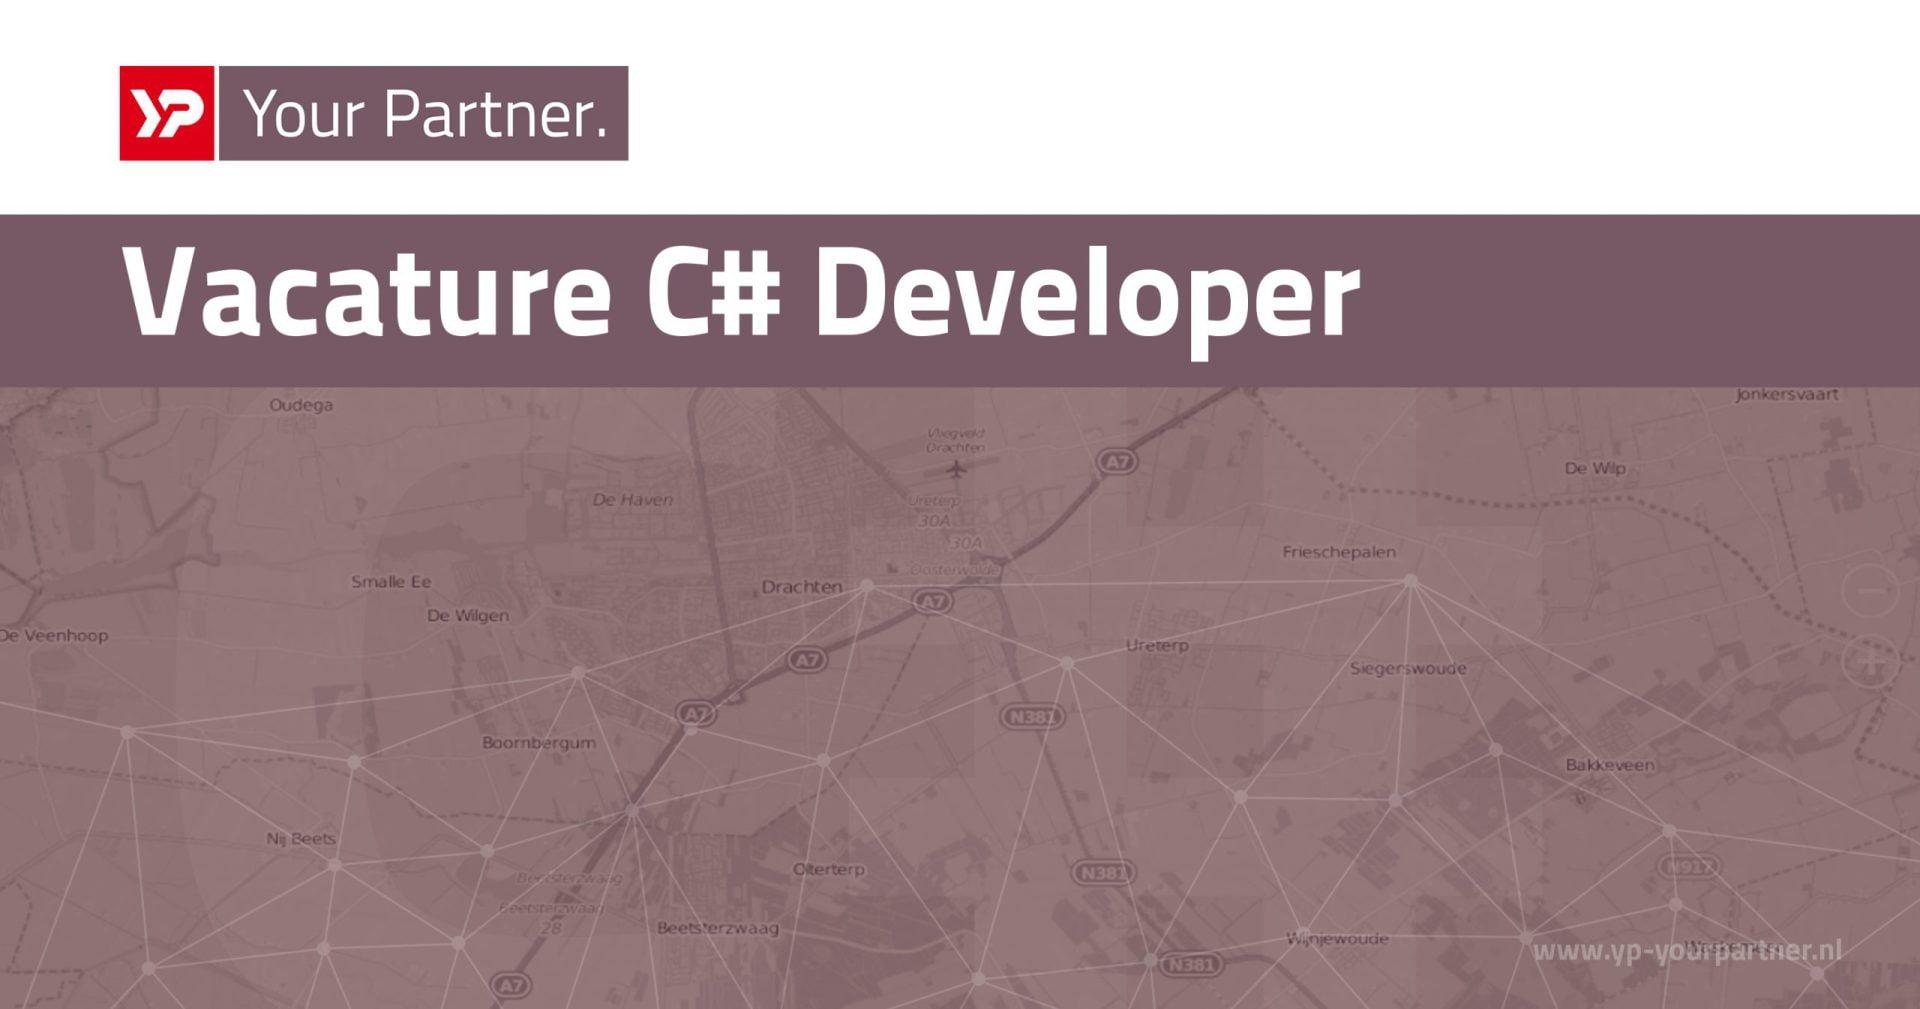 YP Your Partner - C# Developer vacature